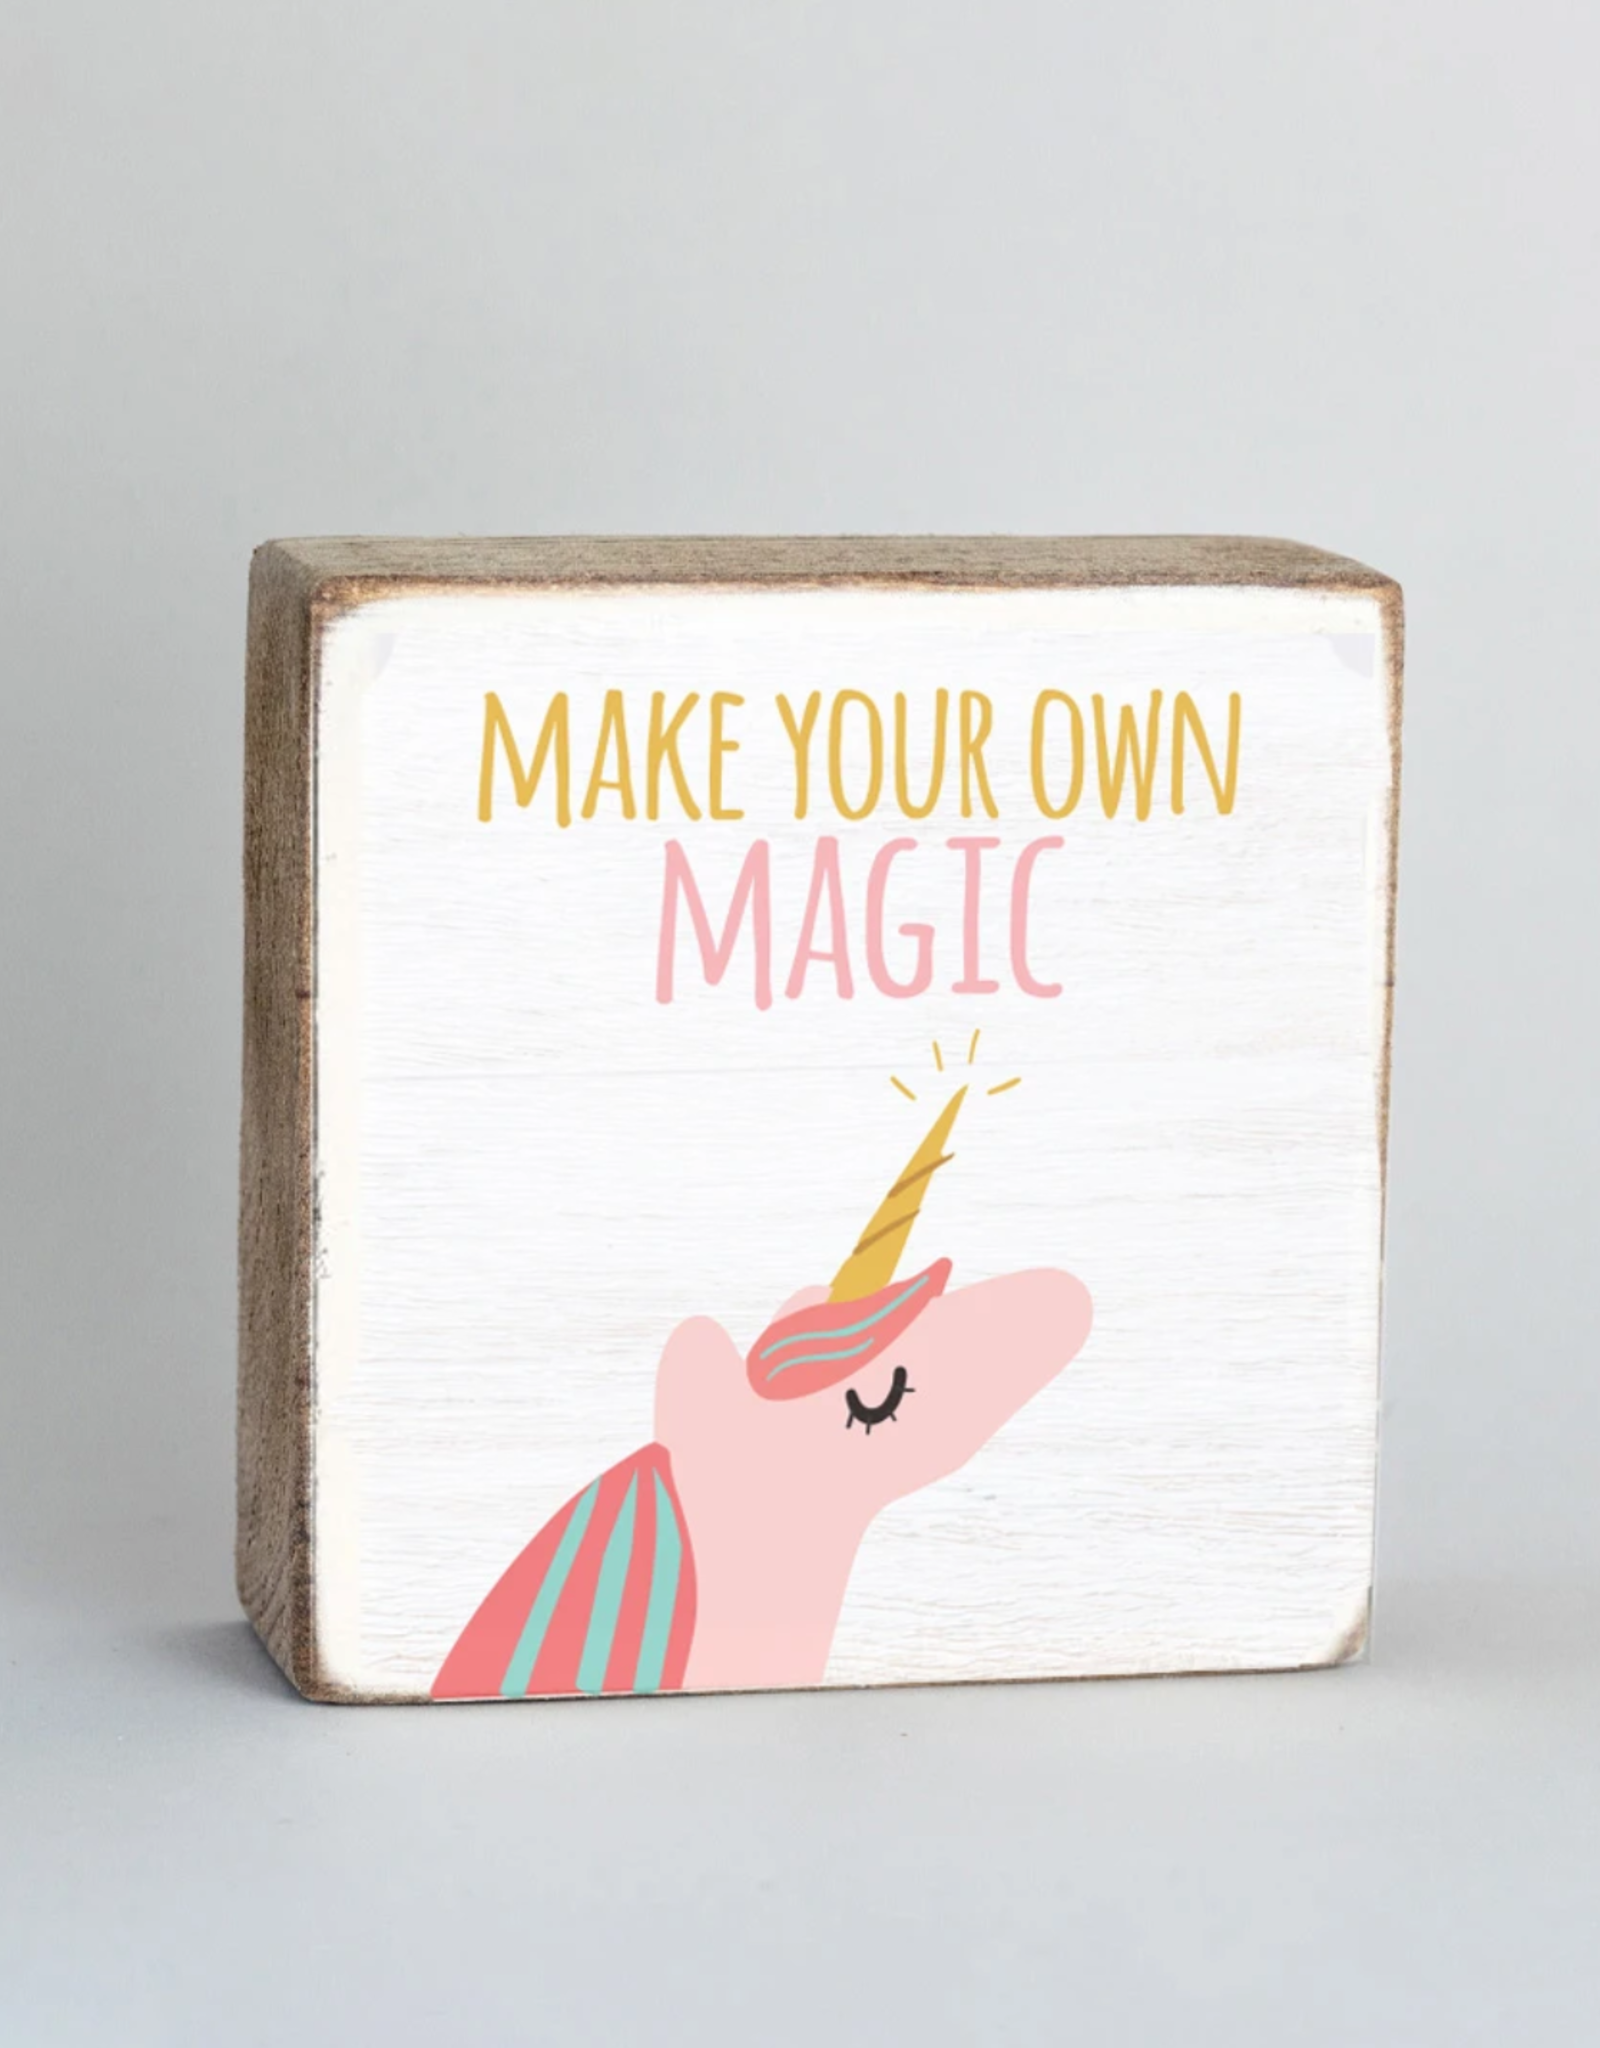 Rustic Marlin Rustic Marlin - Unicorn Magic 6x6 Block